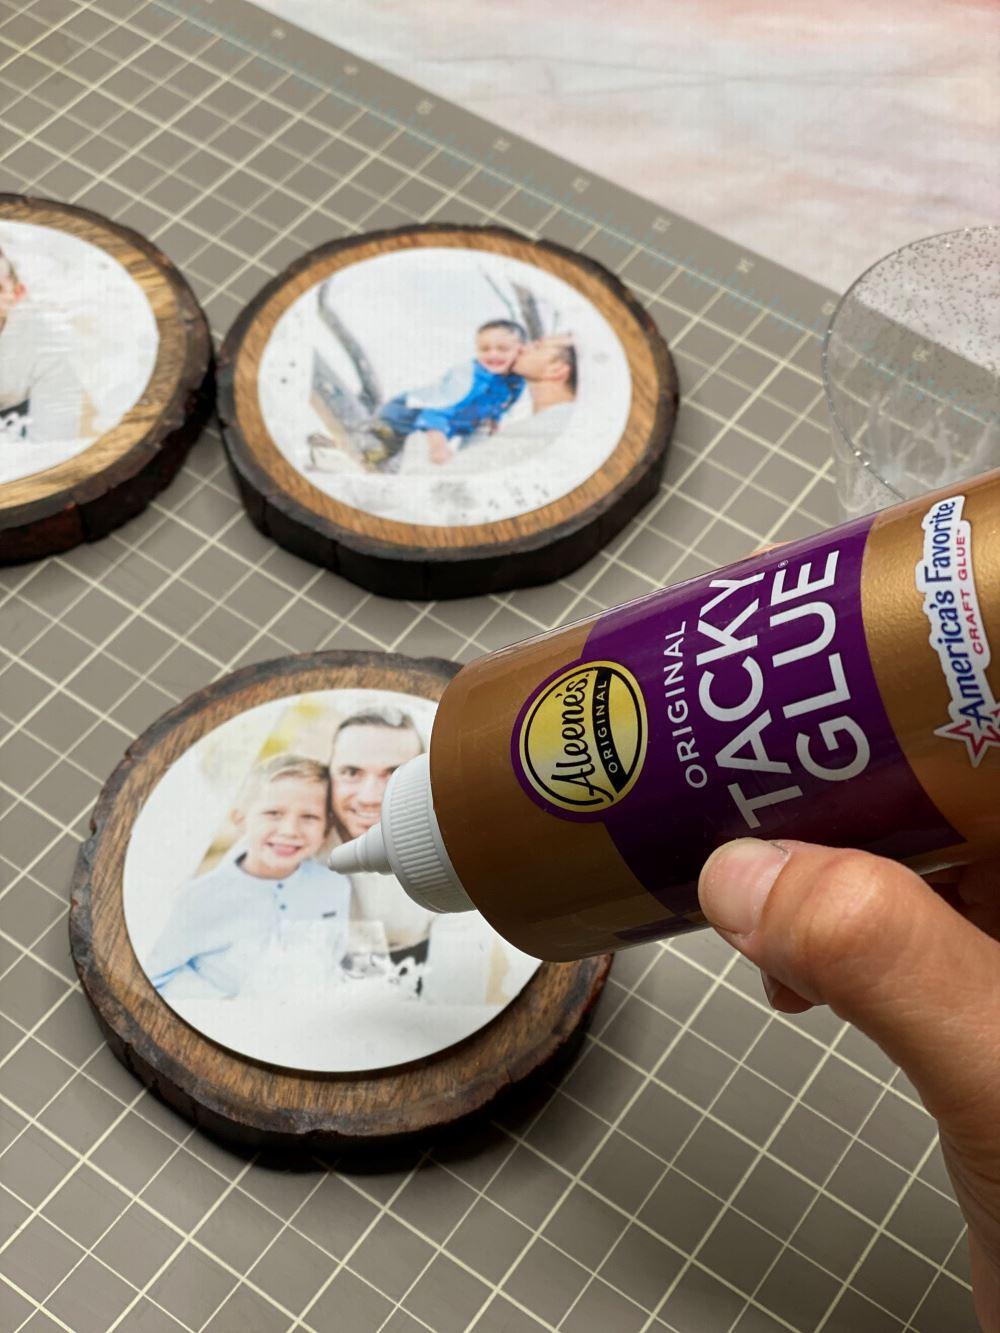 Glue each photo onto a coaster